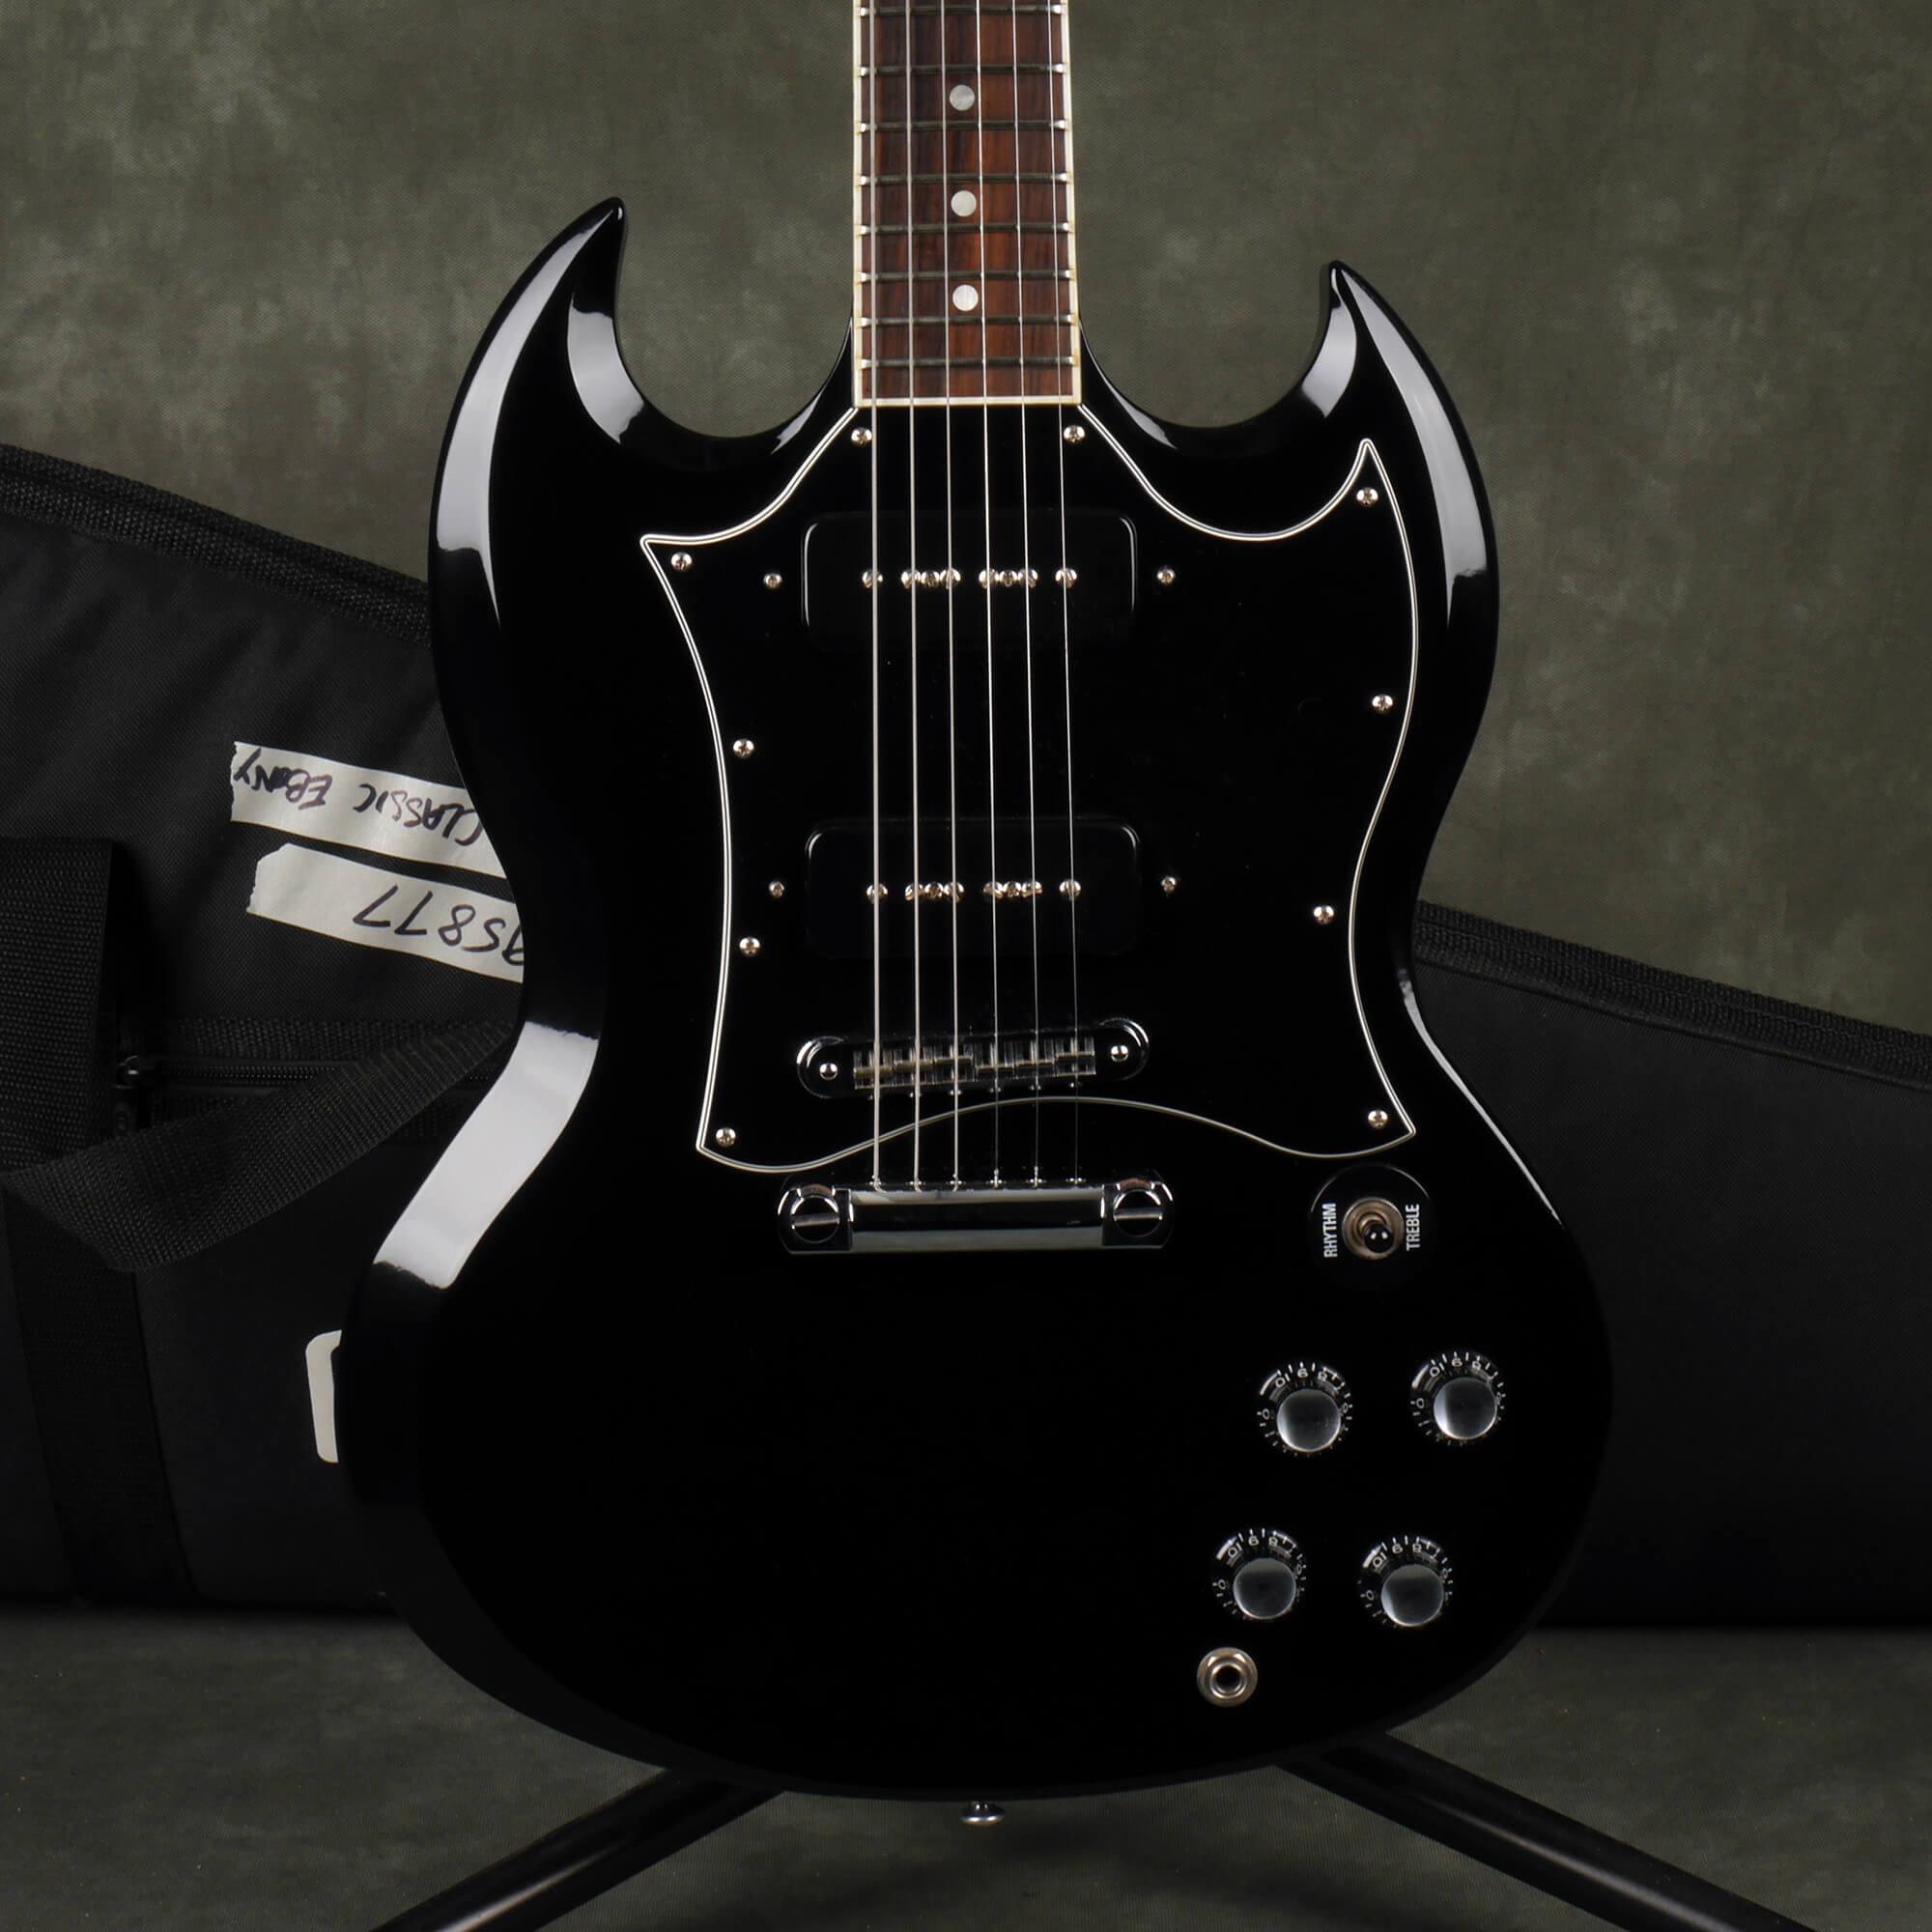 Gibson 2005 SG Classic - Ebony w/Gig Bag - 2nd Hand